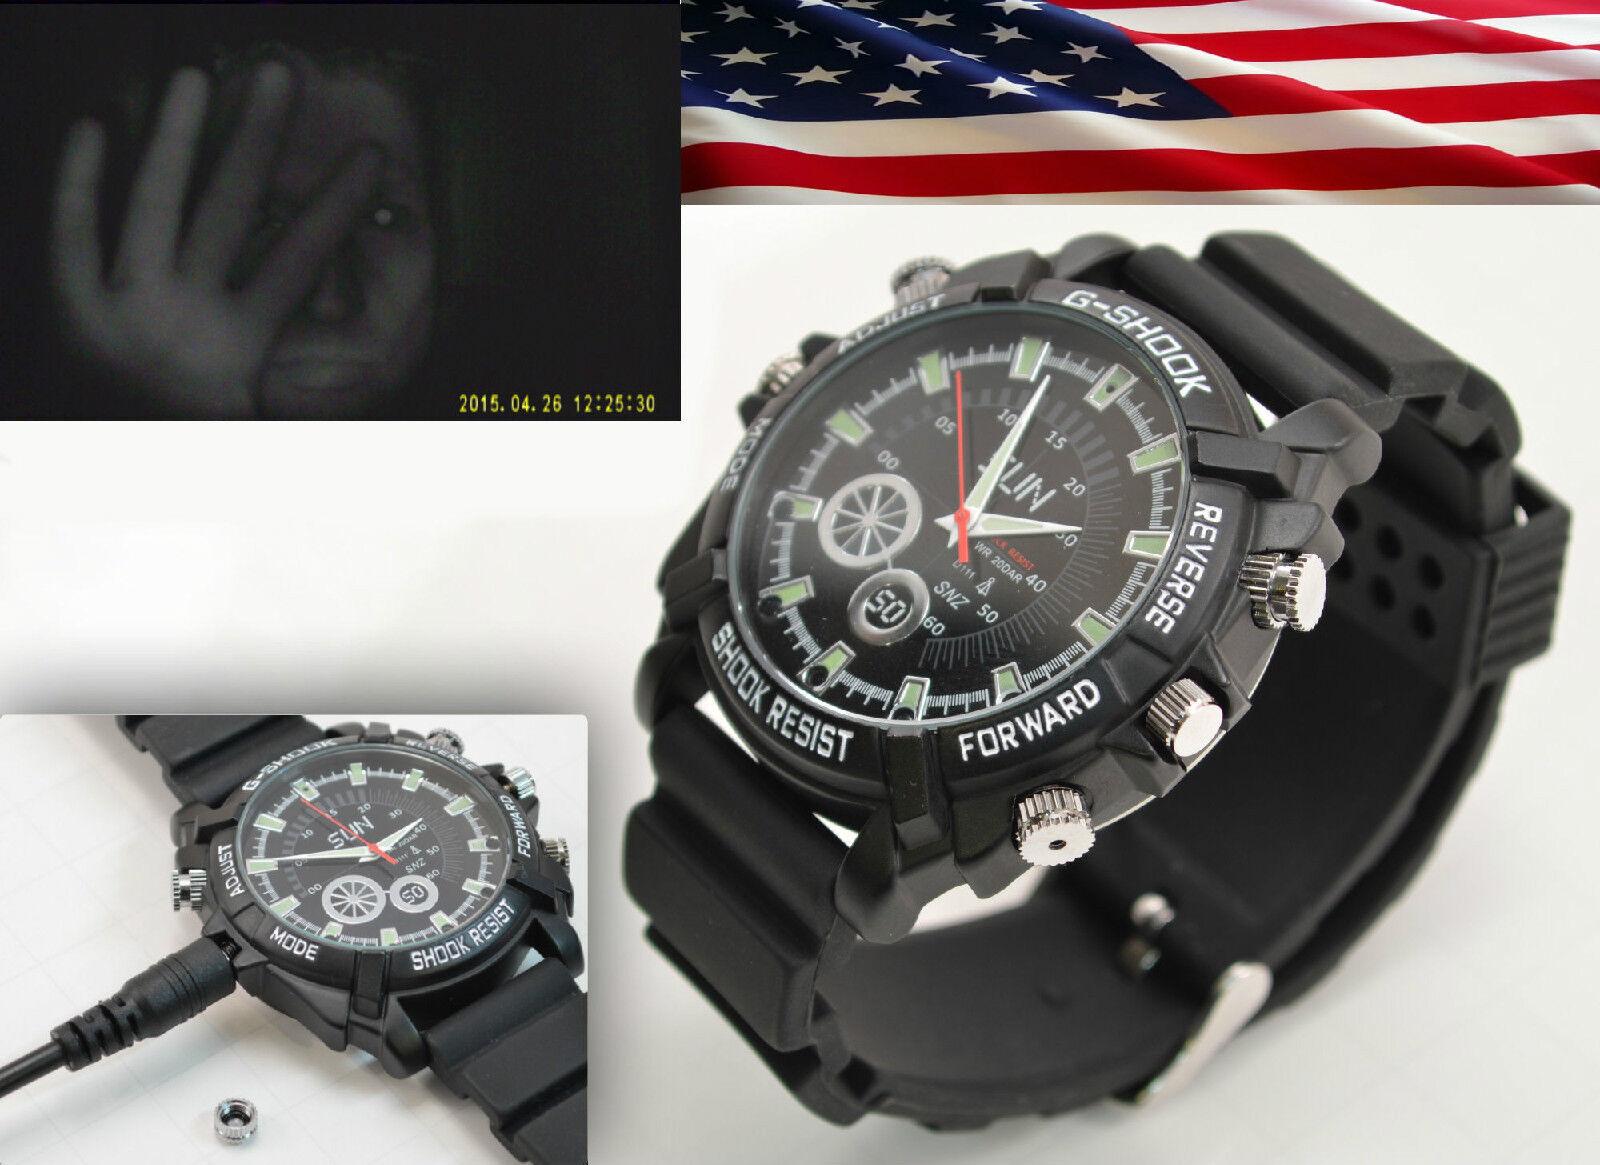 1080p Waterproof Spy Watch Infrared Night Vision Camera V...